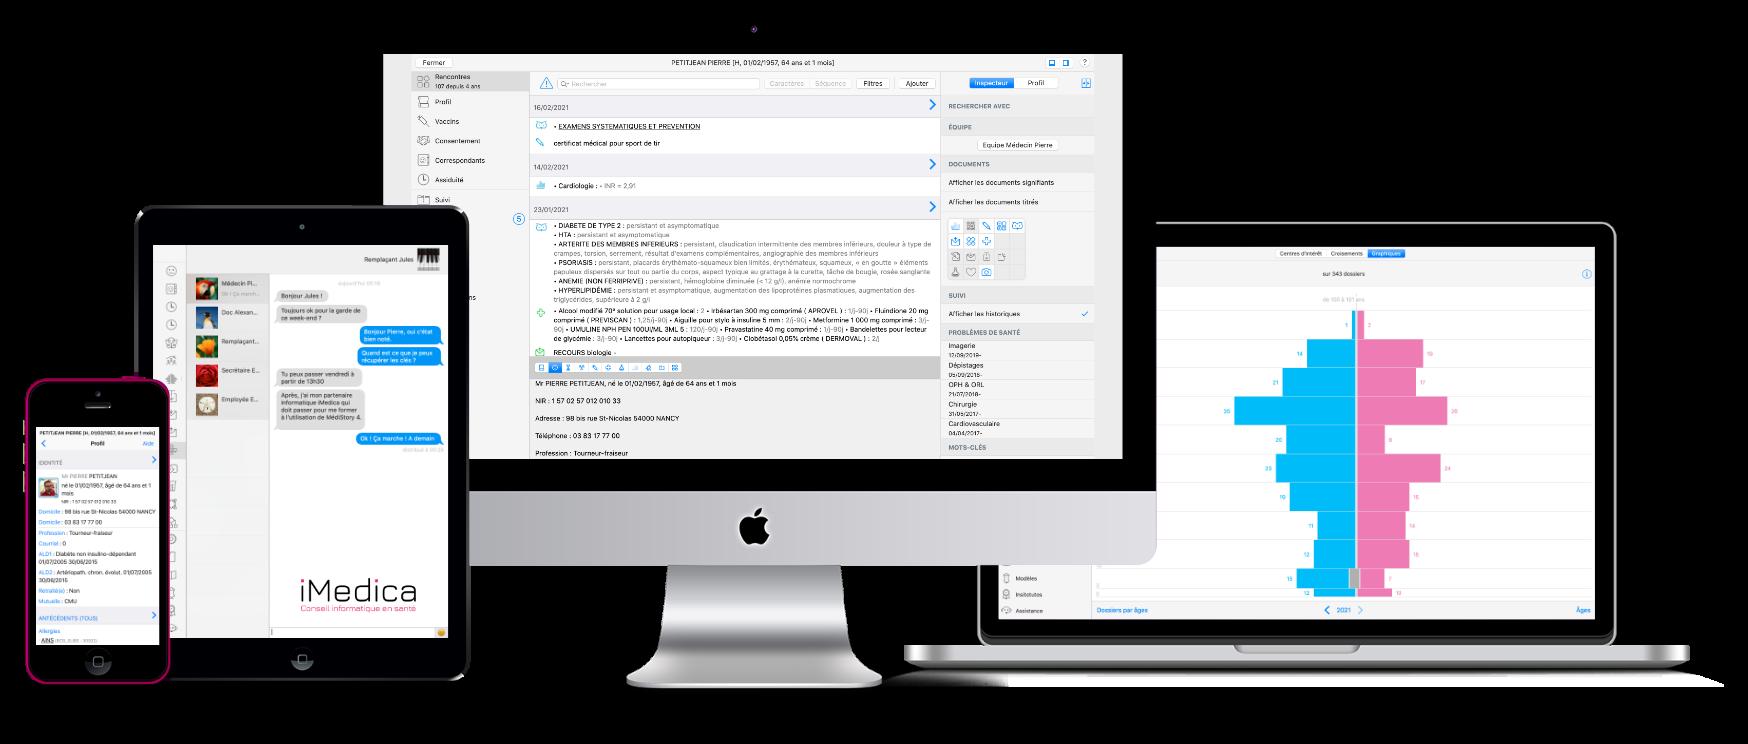 Logiciel MédiStory sur Mac, iPad et iPhone